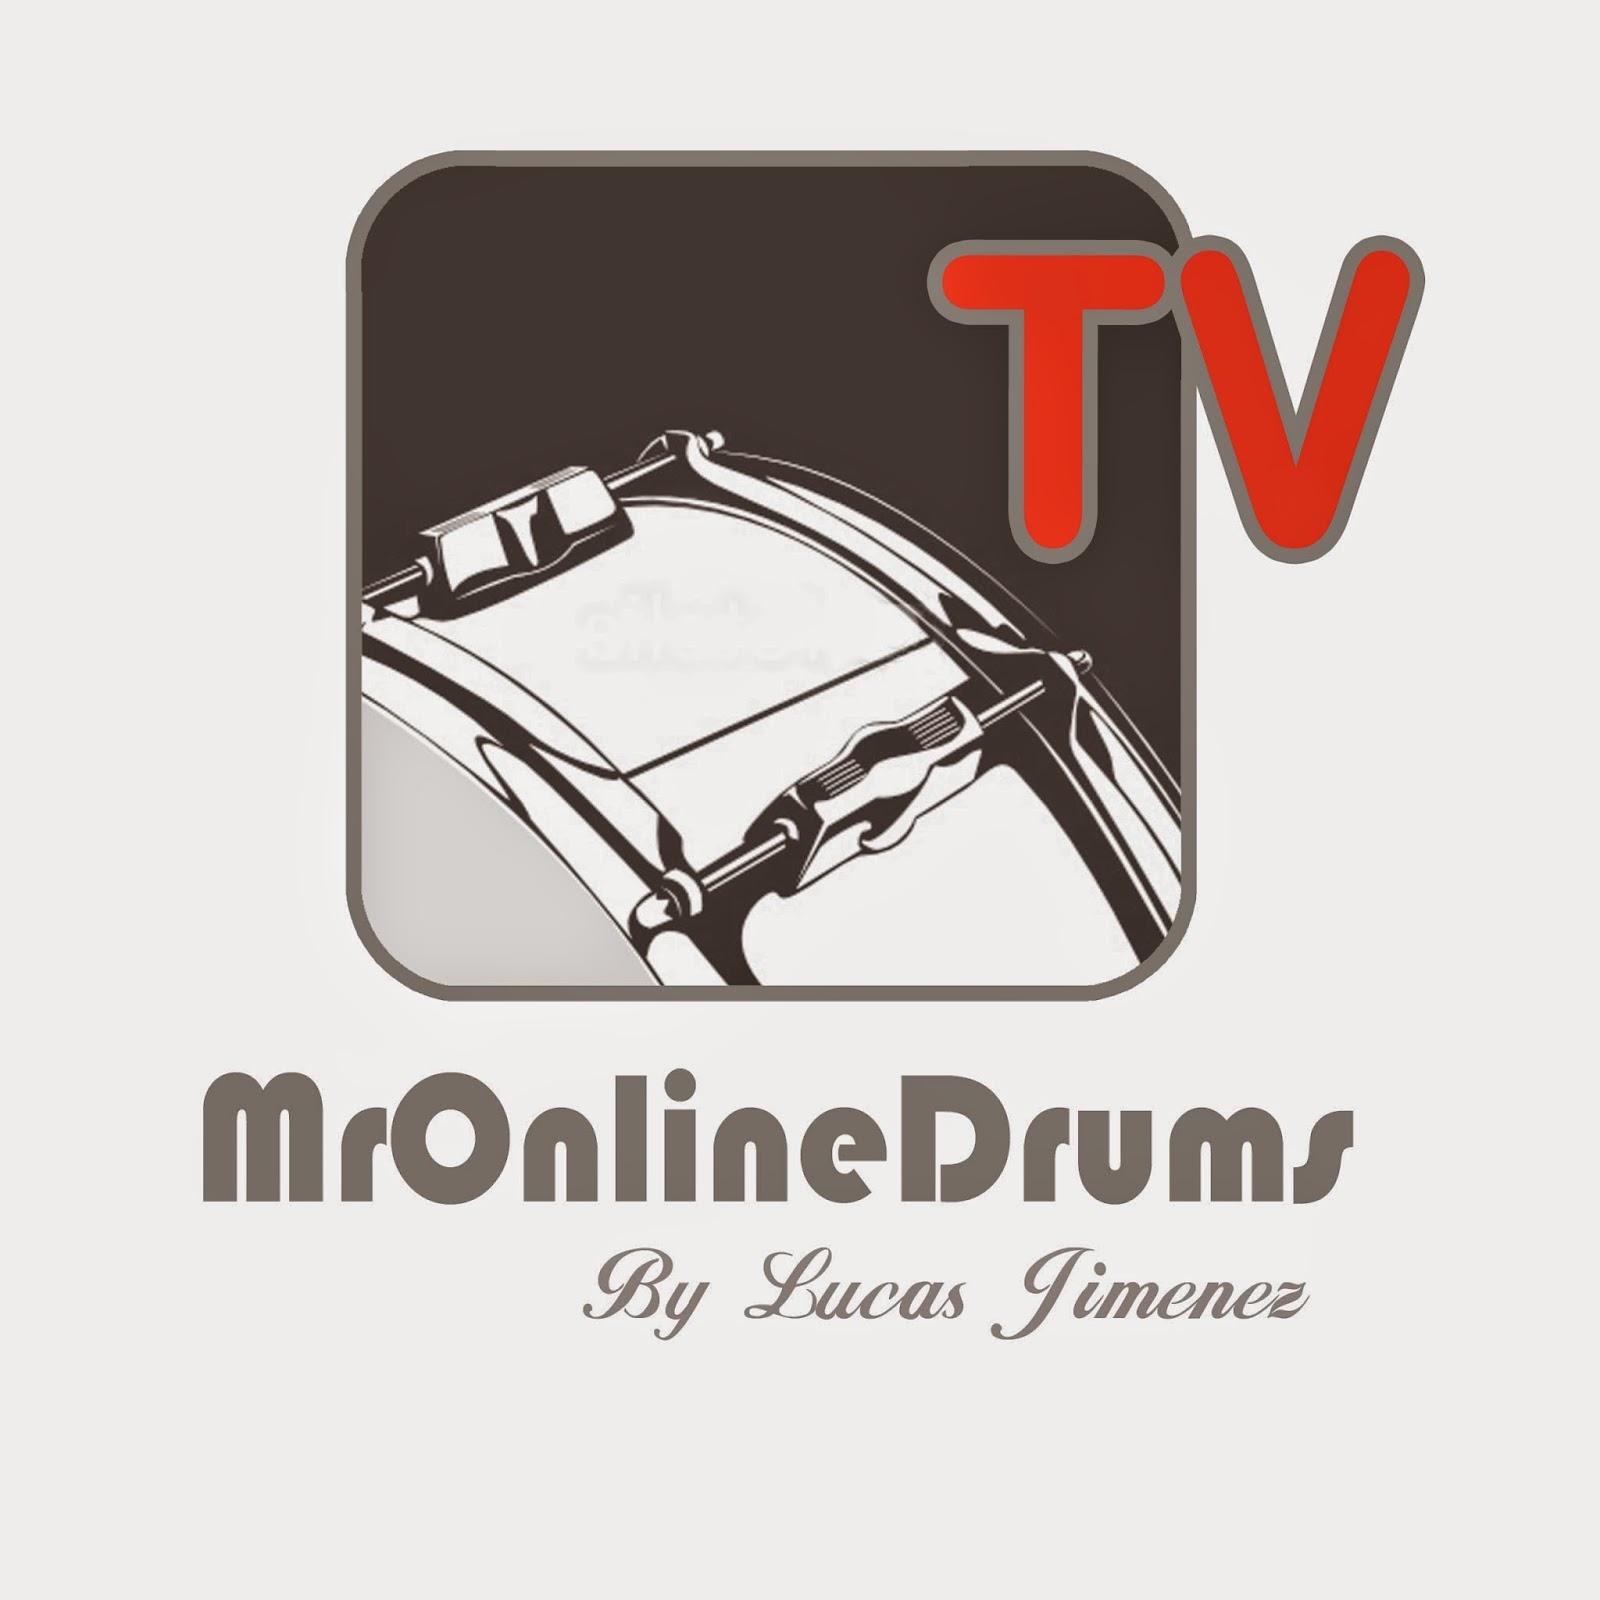 massbateria-canal de youtube de mronlinedrumstv